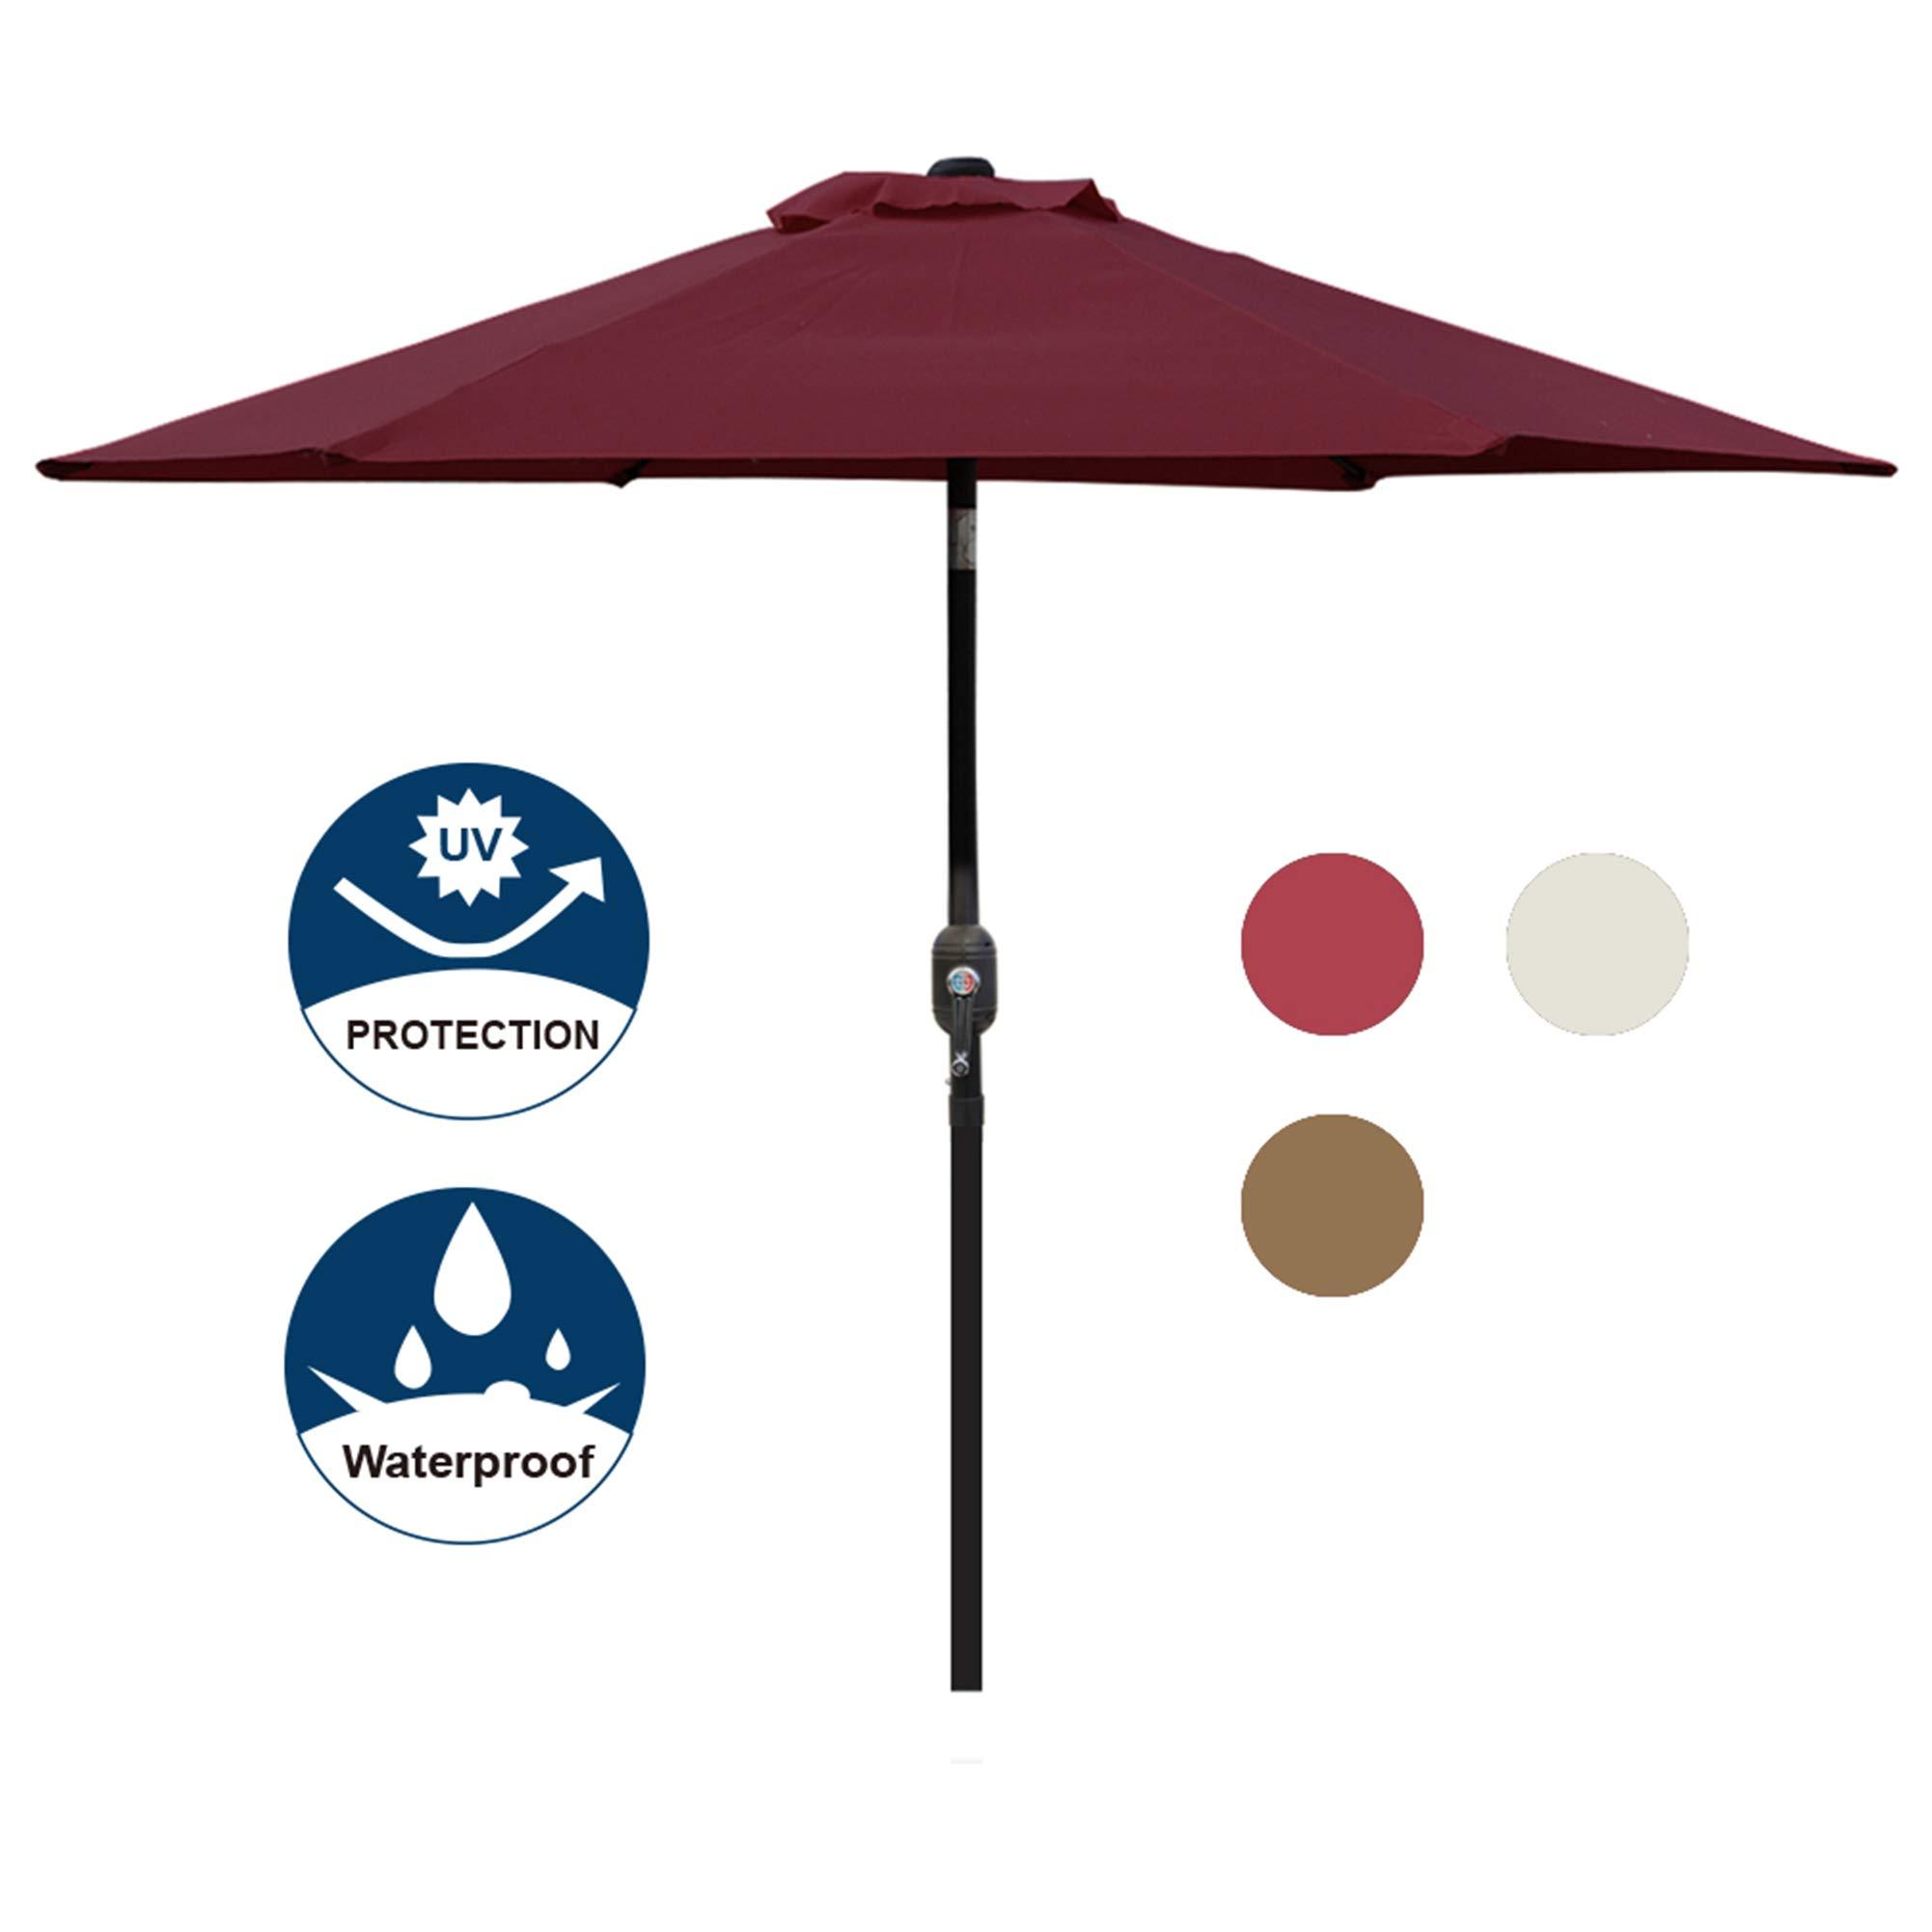 Blissun 7.5 ft Patio Umbrella, Yard Umbrella Push Button Tilt Crank(Red) by Blissun (Image #1)